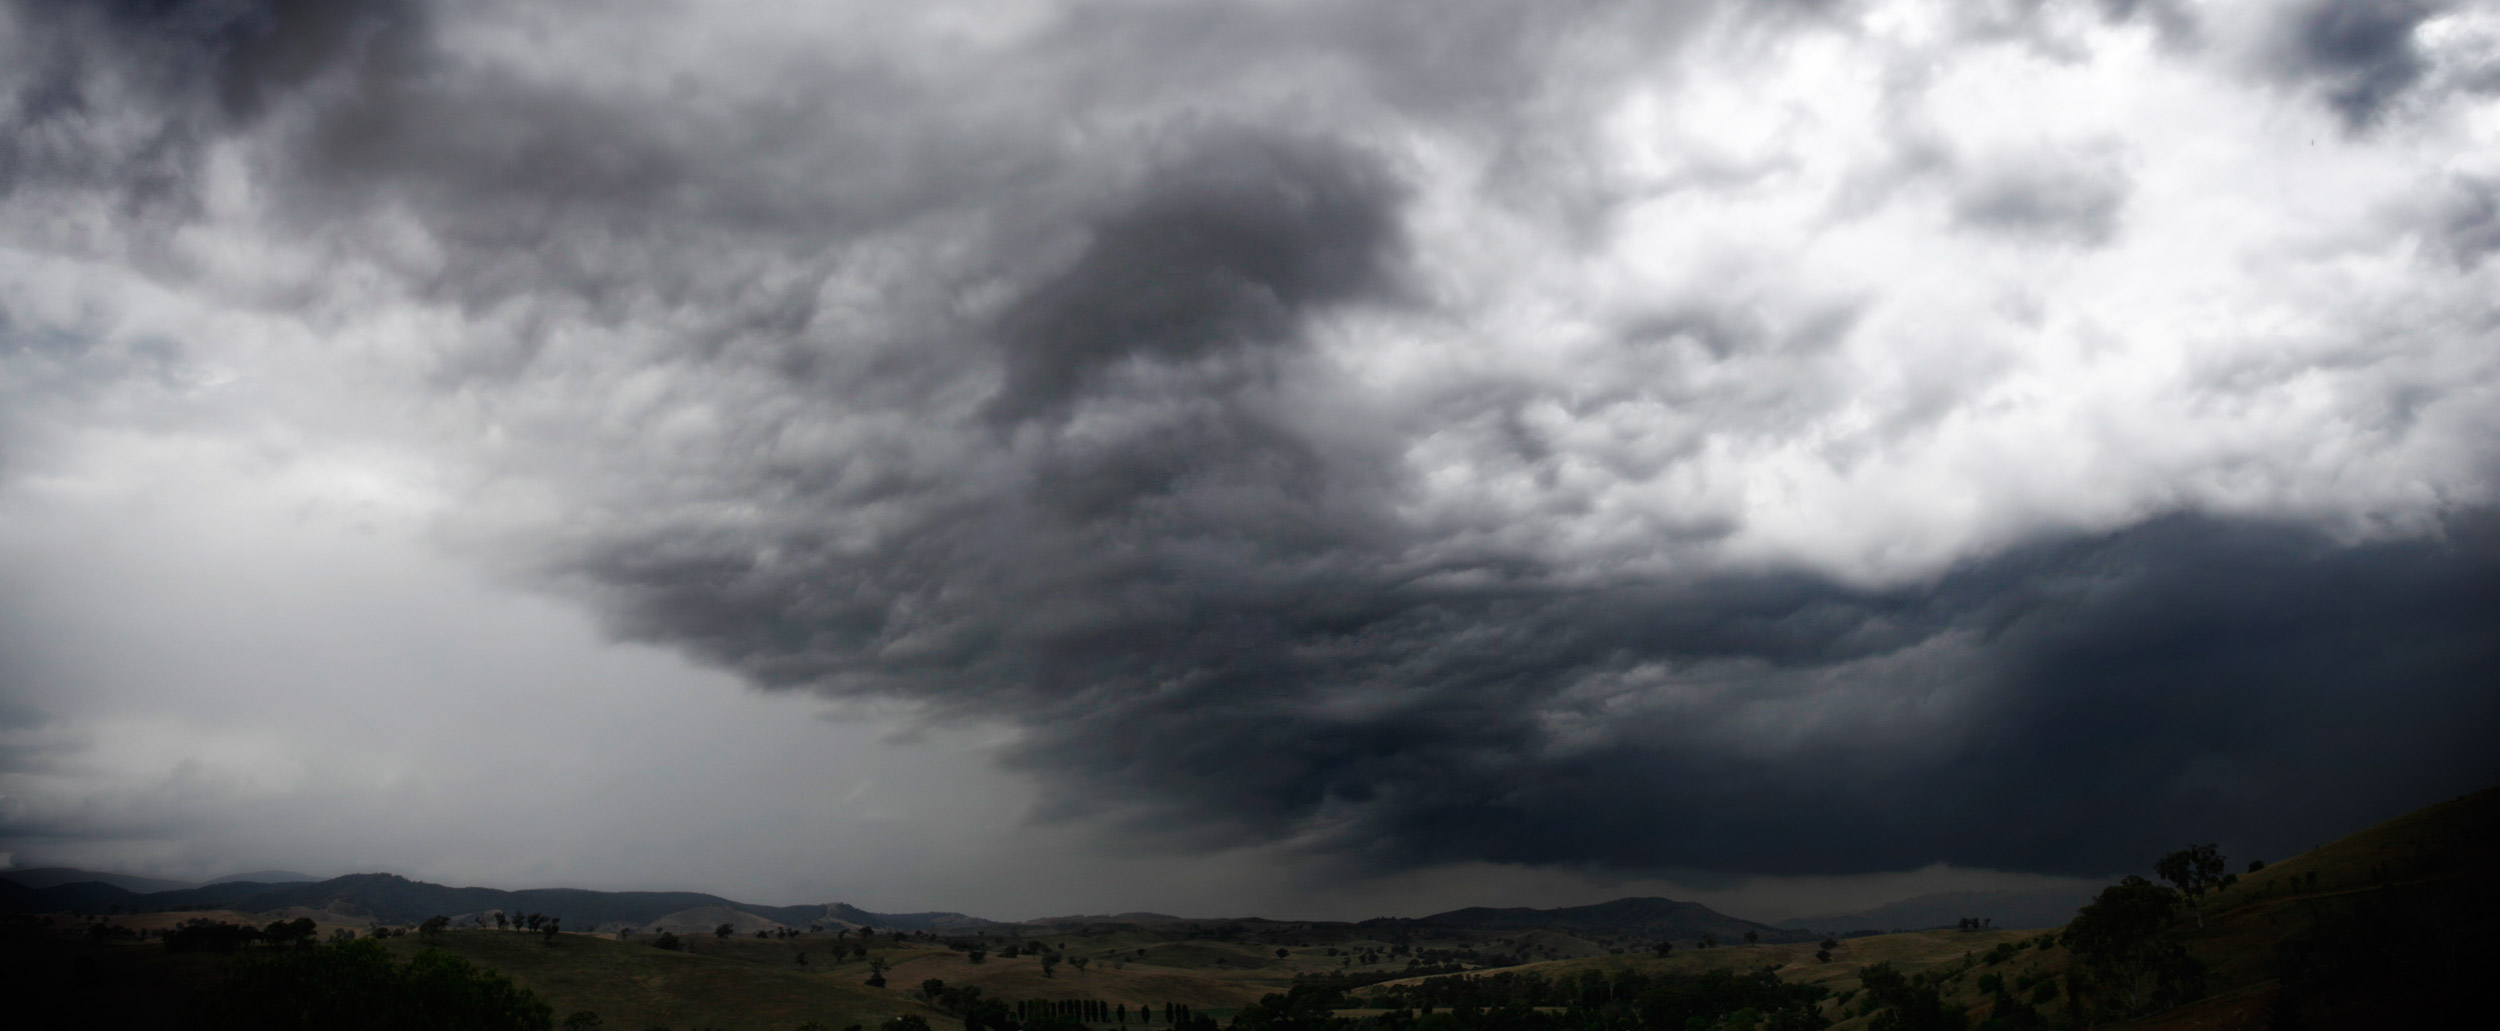 storm_clouds_over_swifts_creek.jpg